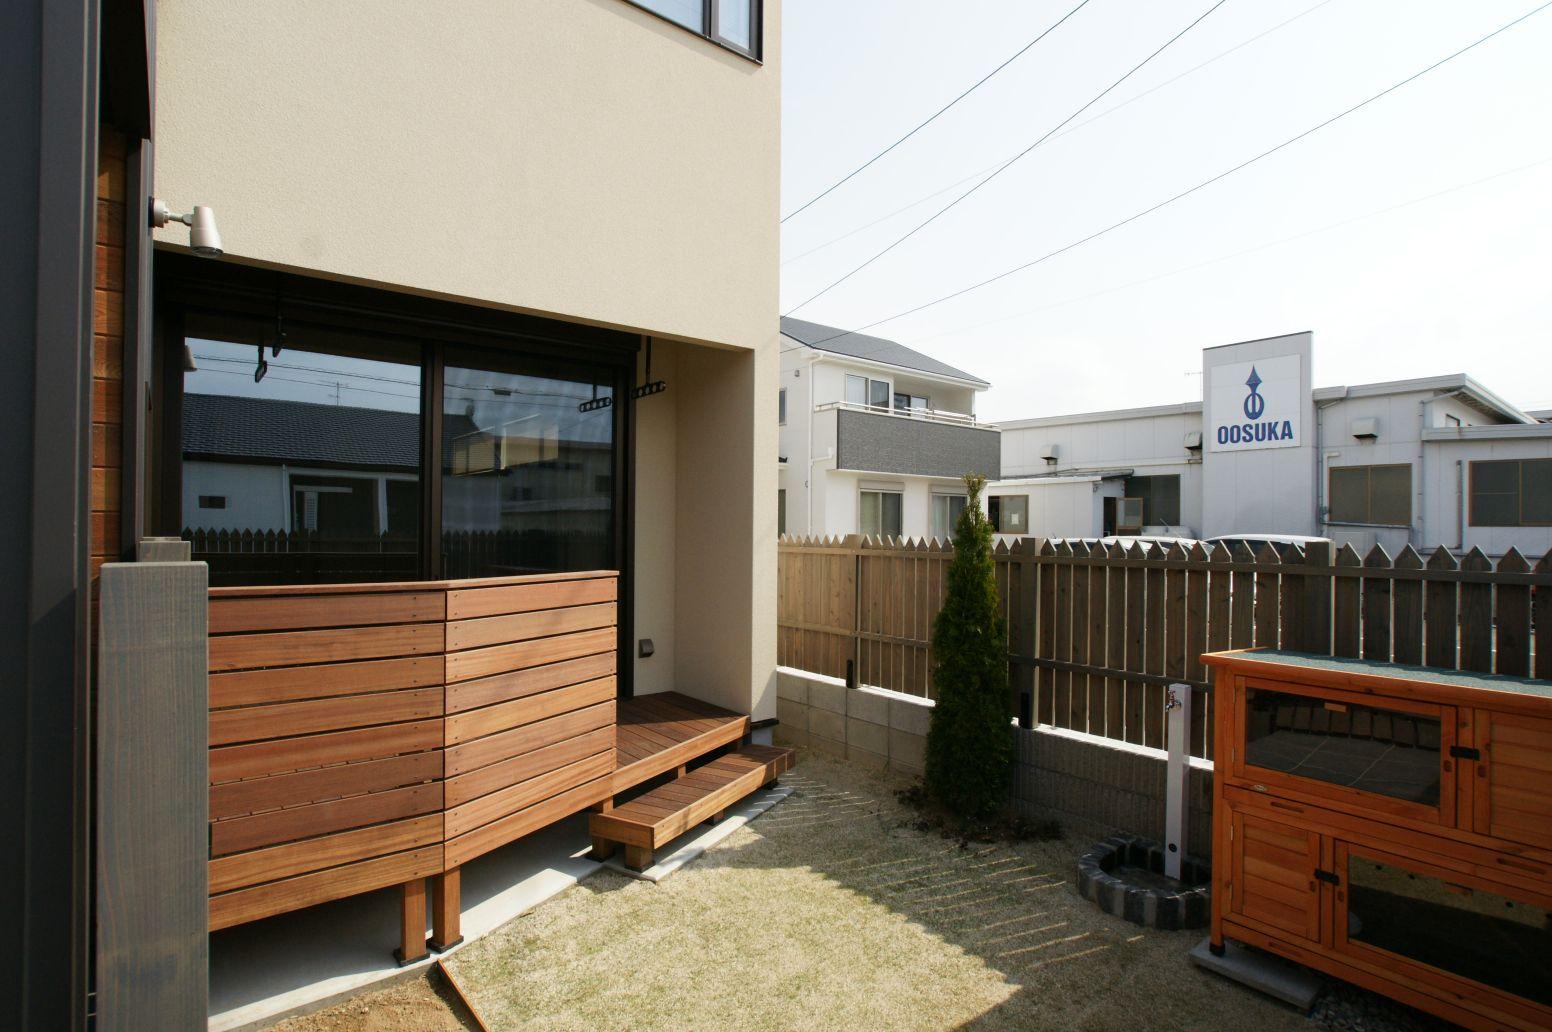 RIKYU (リキュー)【デザイン住宅、省エネ、インテリア】プライバシーにも配慮された庭